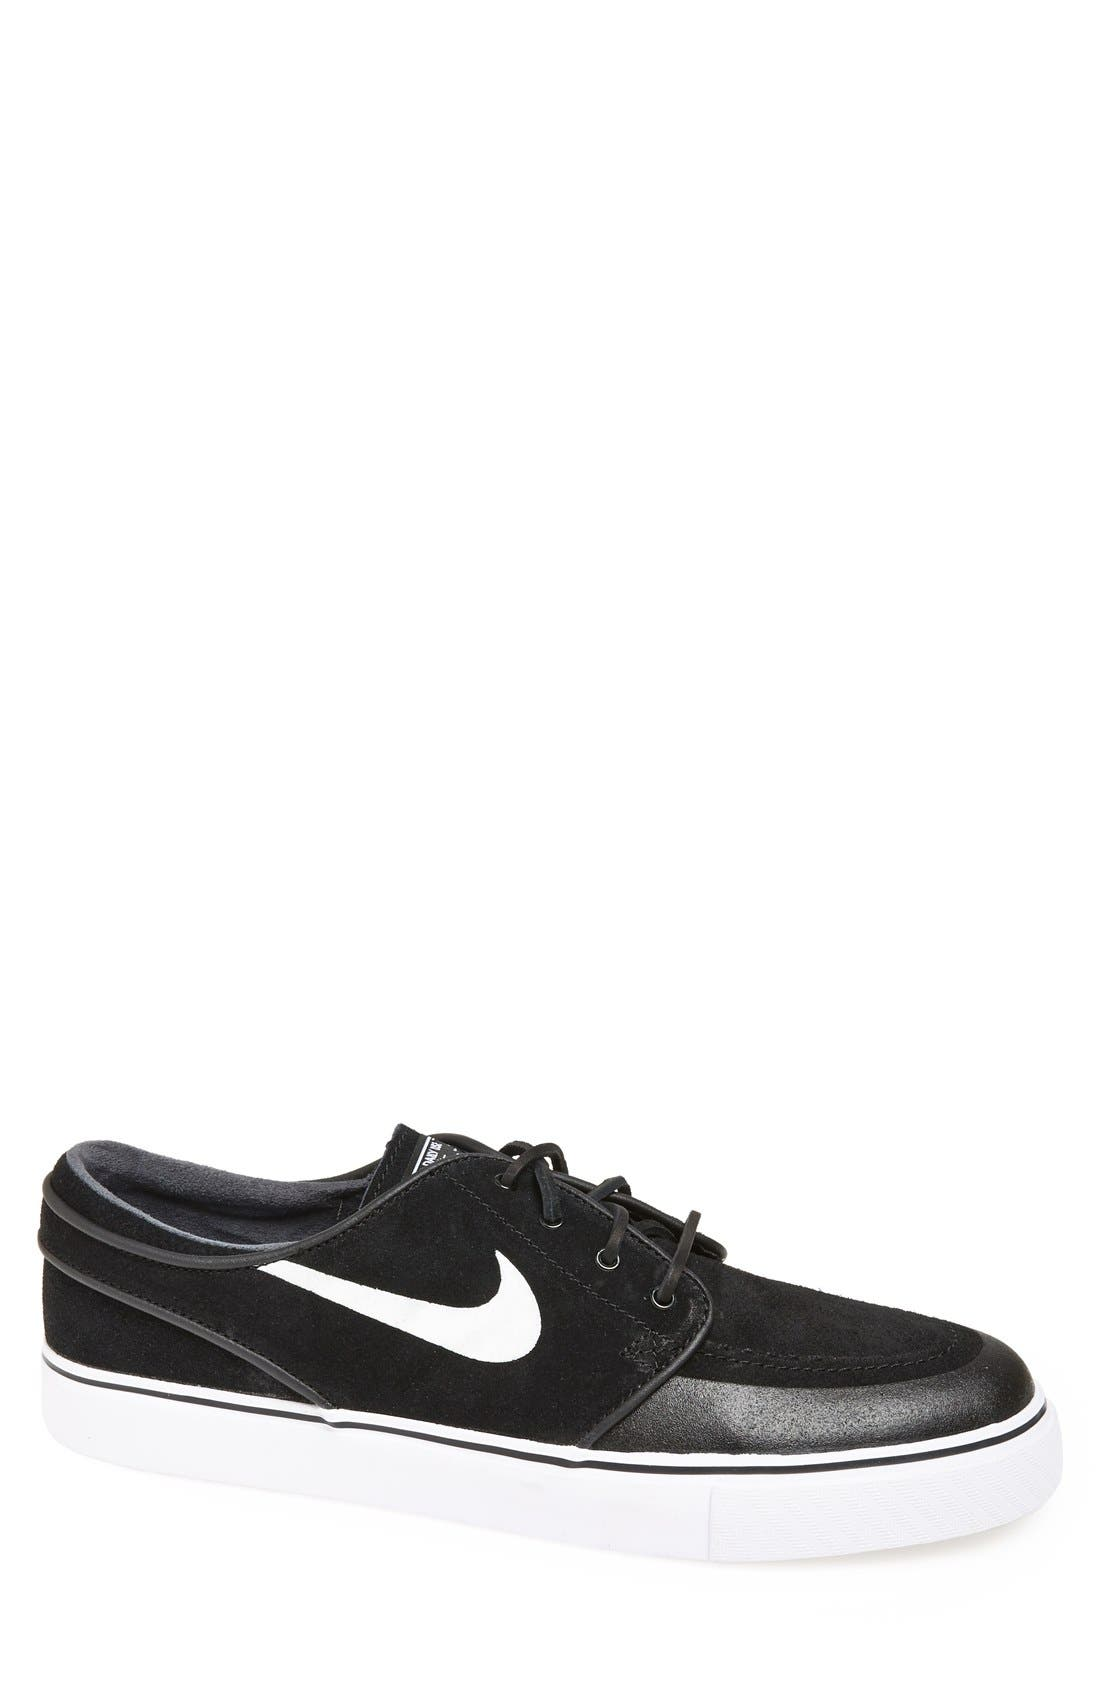 Alternate Image 1 Selected - Nike 'Zoom - Stefan Janoski Premium SE SB' Skate Shoe (Men)